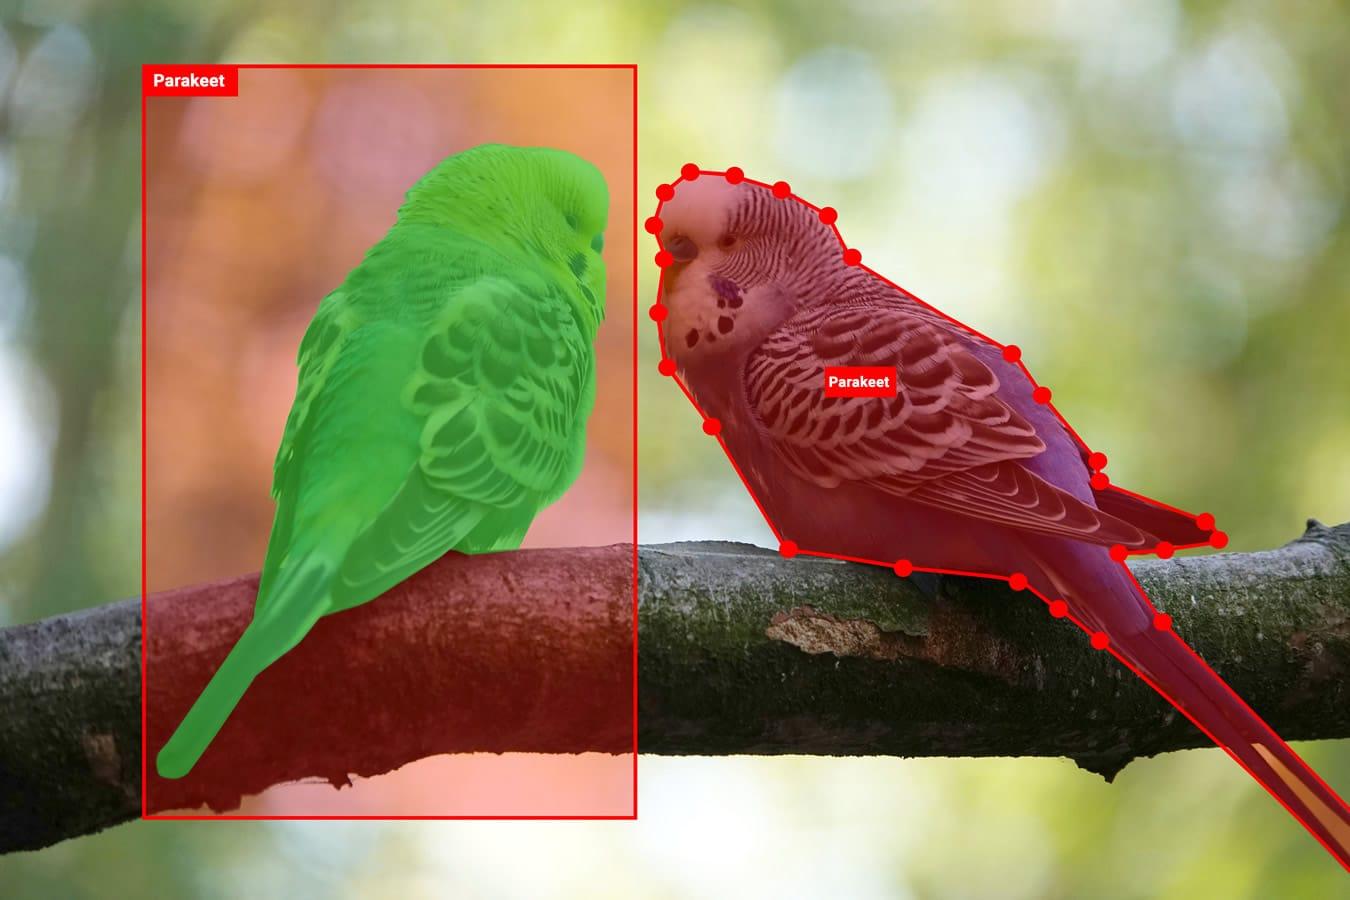 Parakeets - bird detection, labeled birds